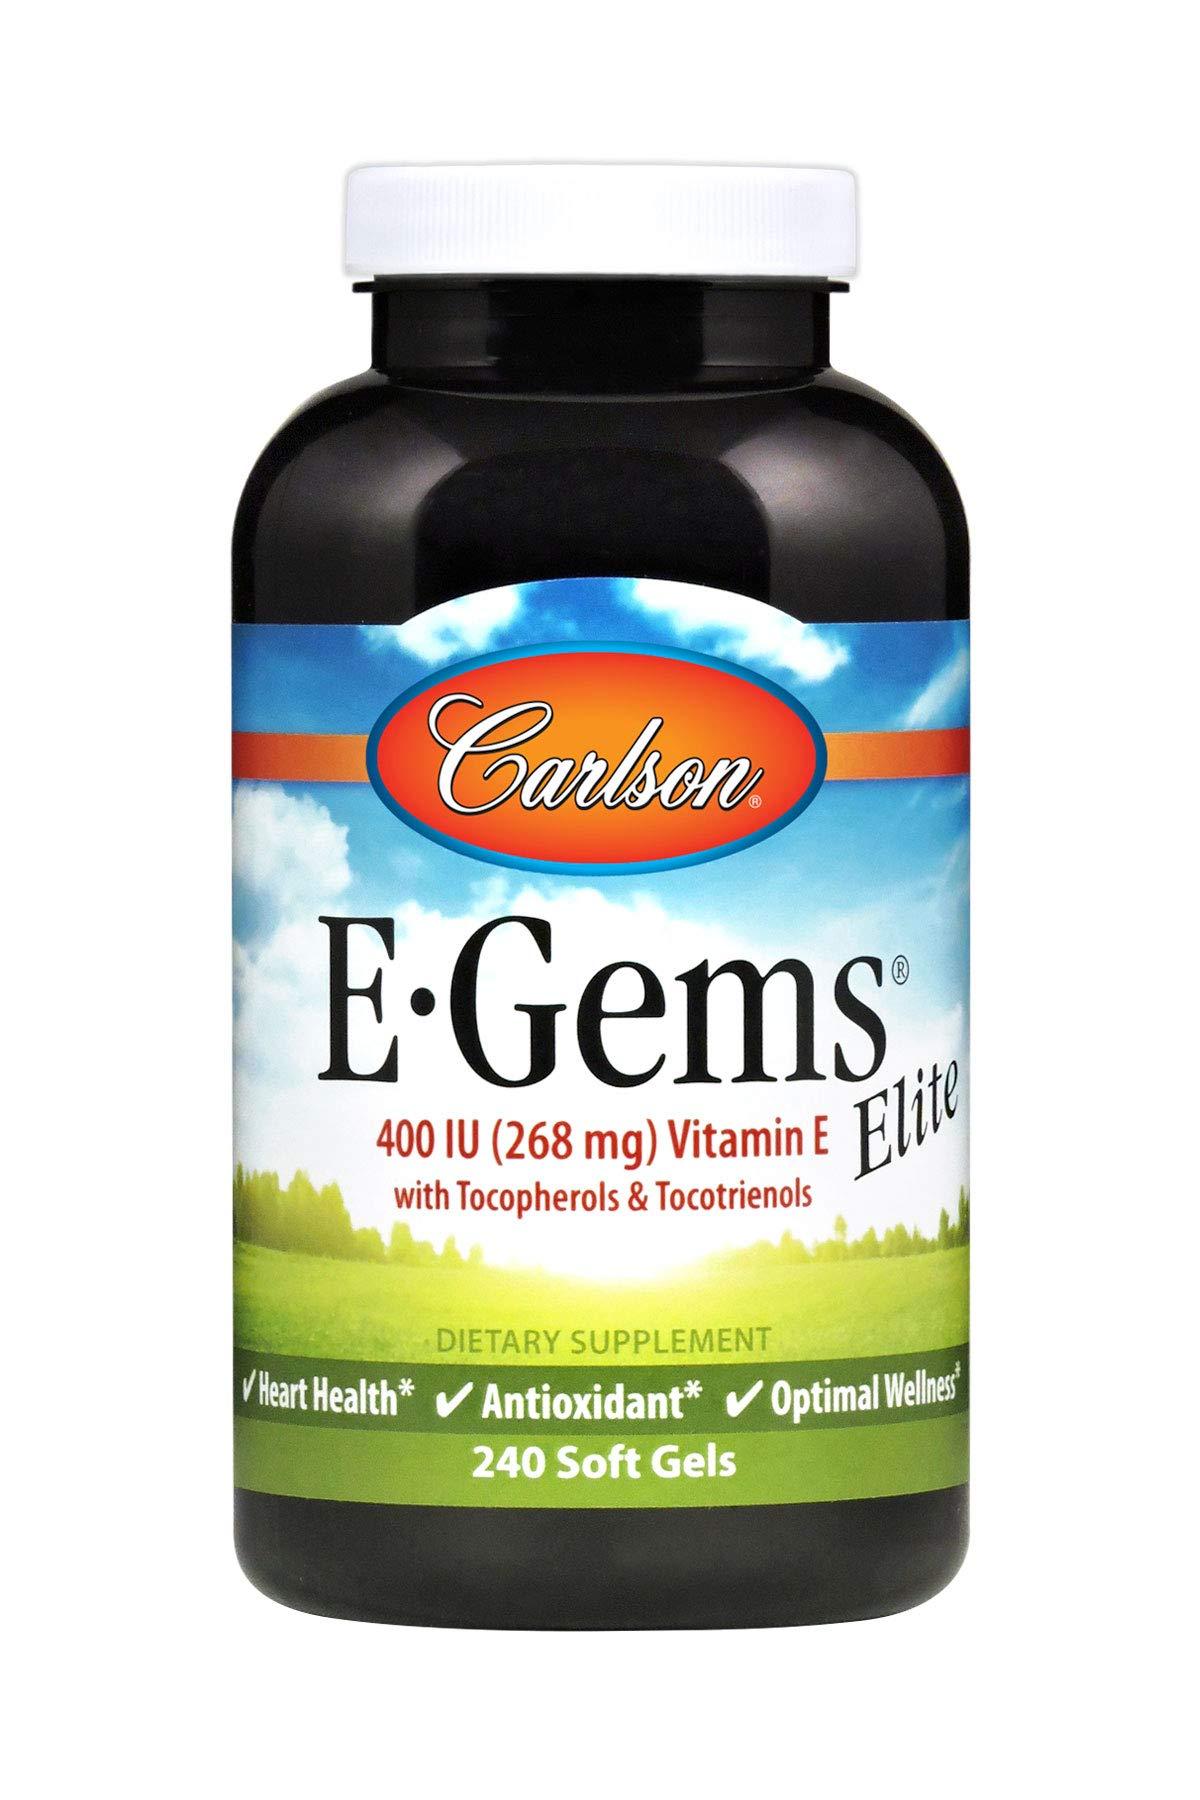 Carlson - E-Gems Elite, 400 IU Vitamin E with Tocopherols & Tocotrienols, Heart Health & Optimal Wellness, Antioxidant, 240 soft gels